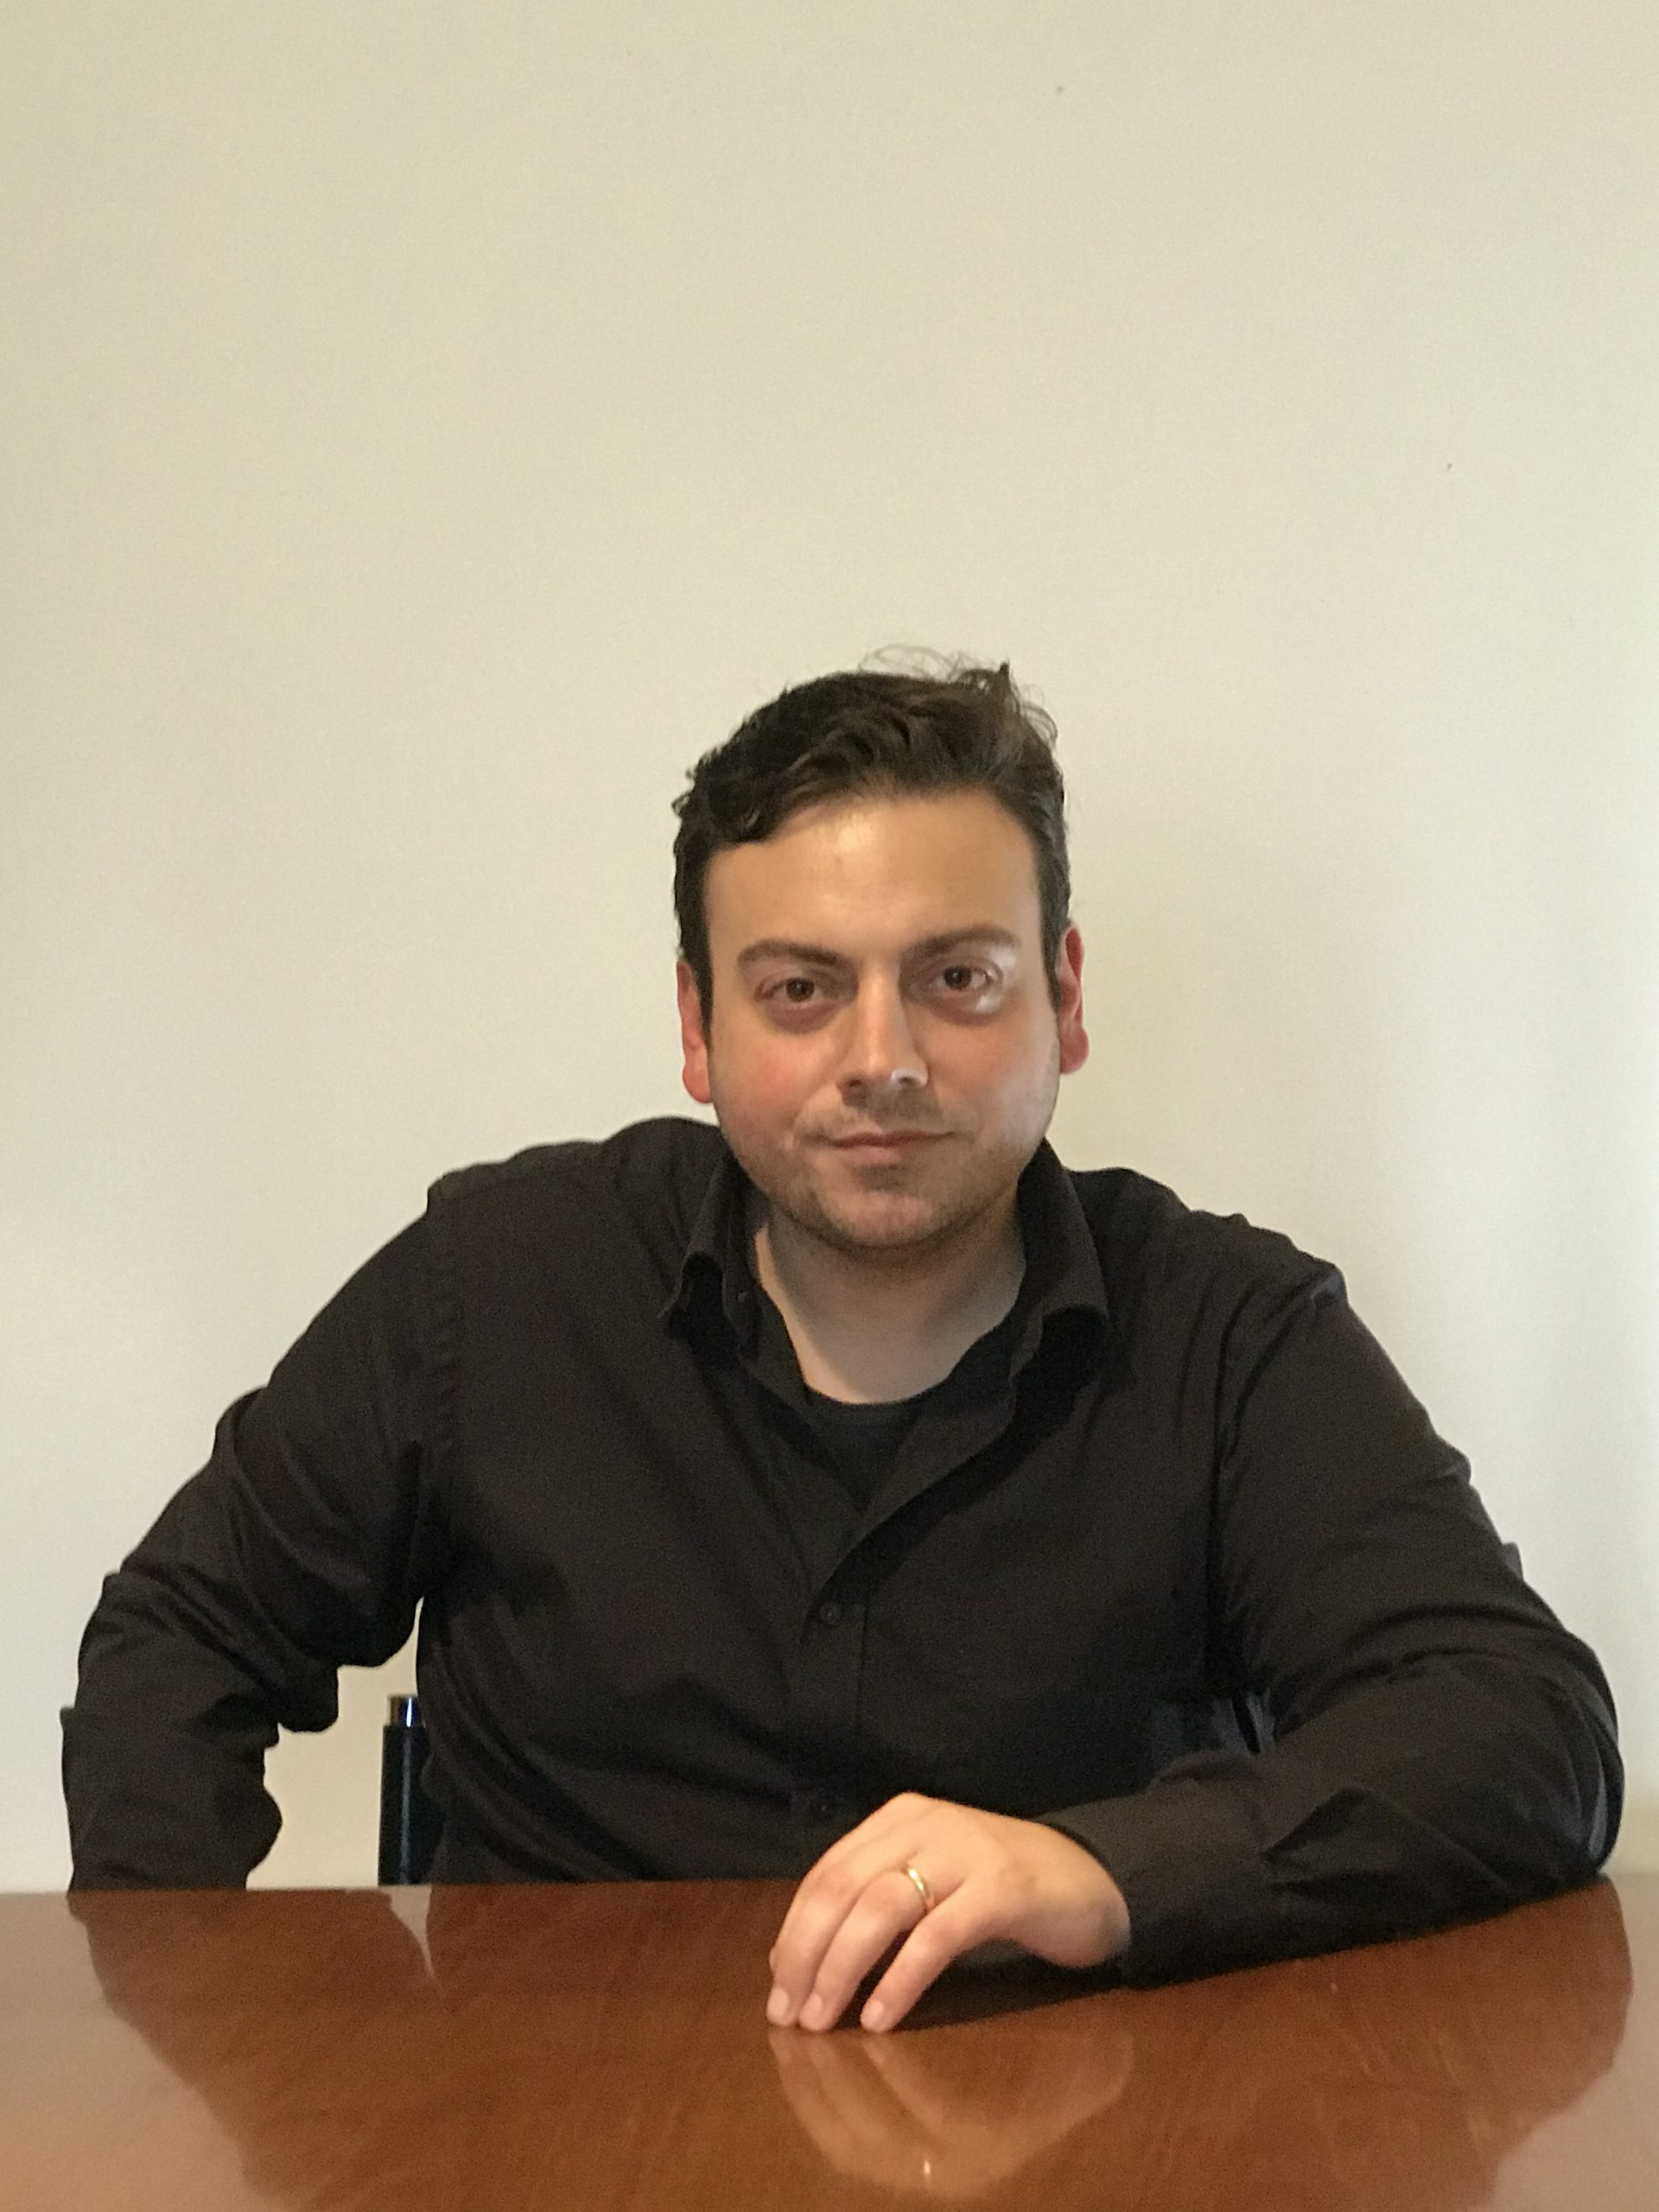 Francesco Giglio